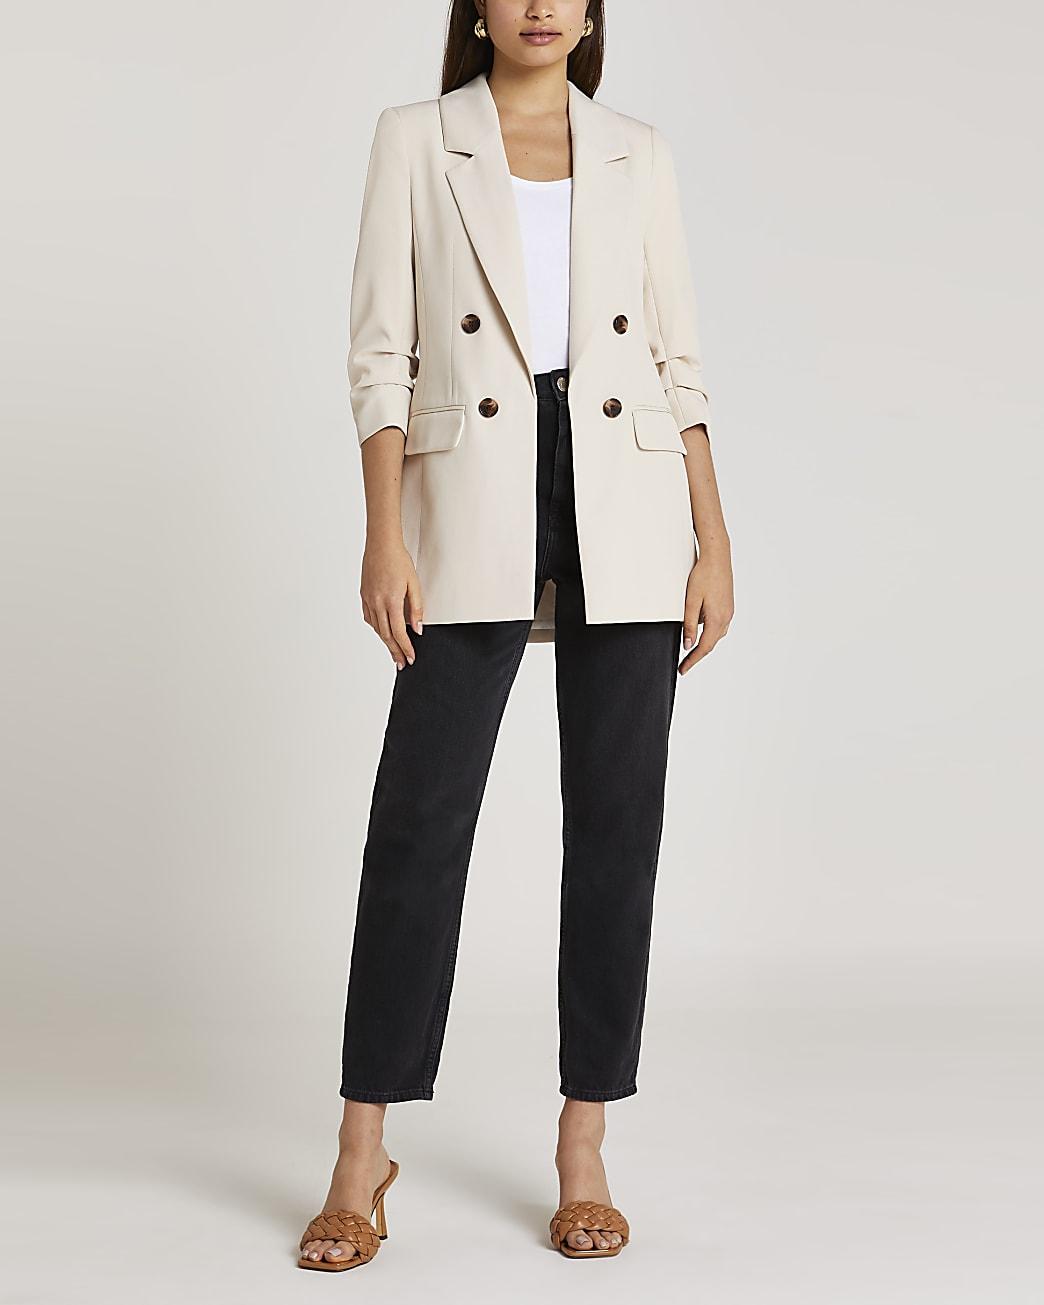 Cream longline blazer